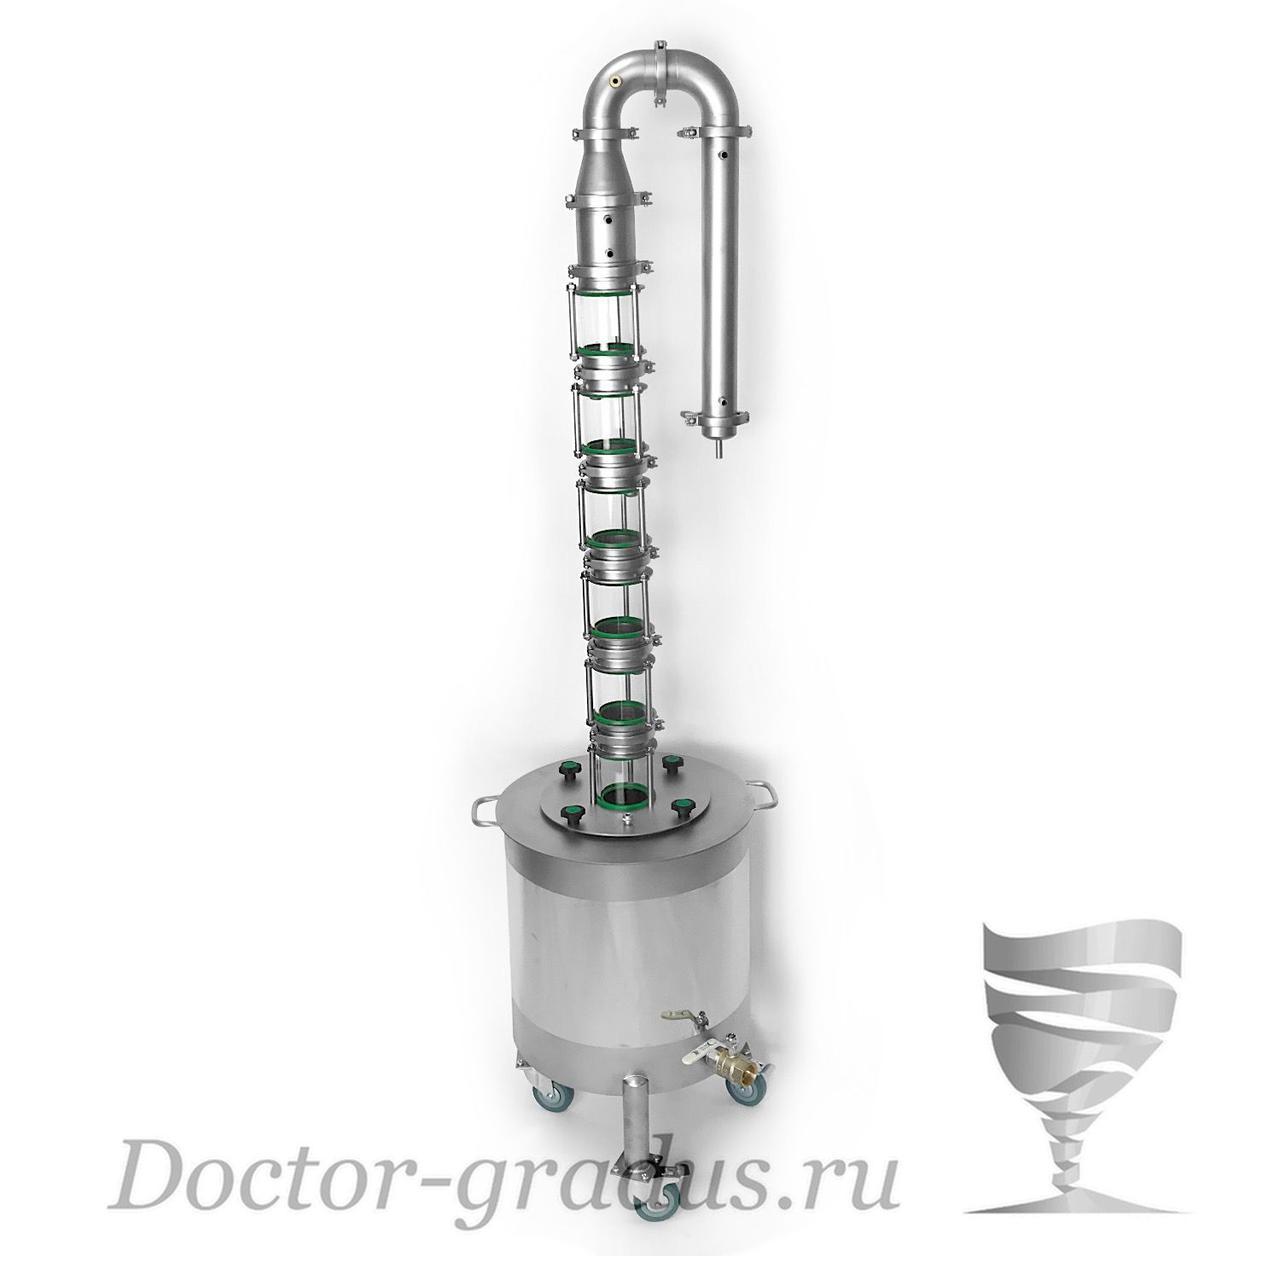 "Дистиллятор Доктор Градус ""Стиллмен-Классик"" с кубом 50 литров"